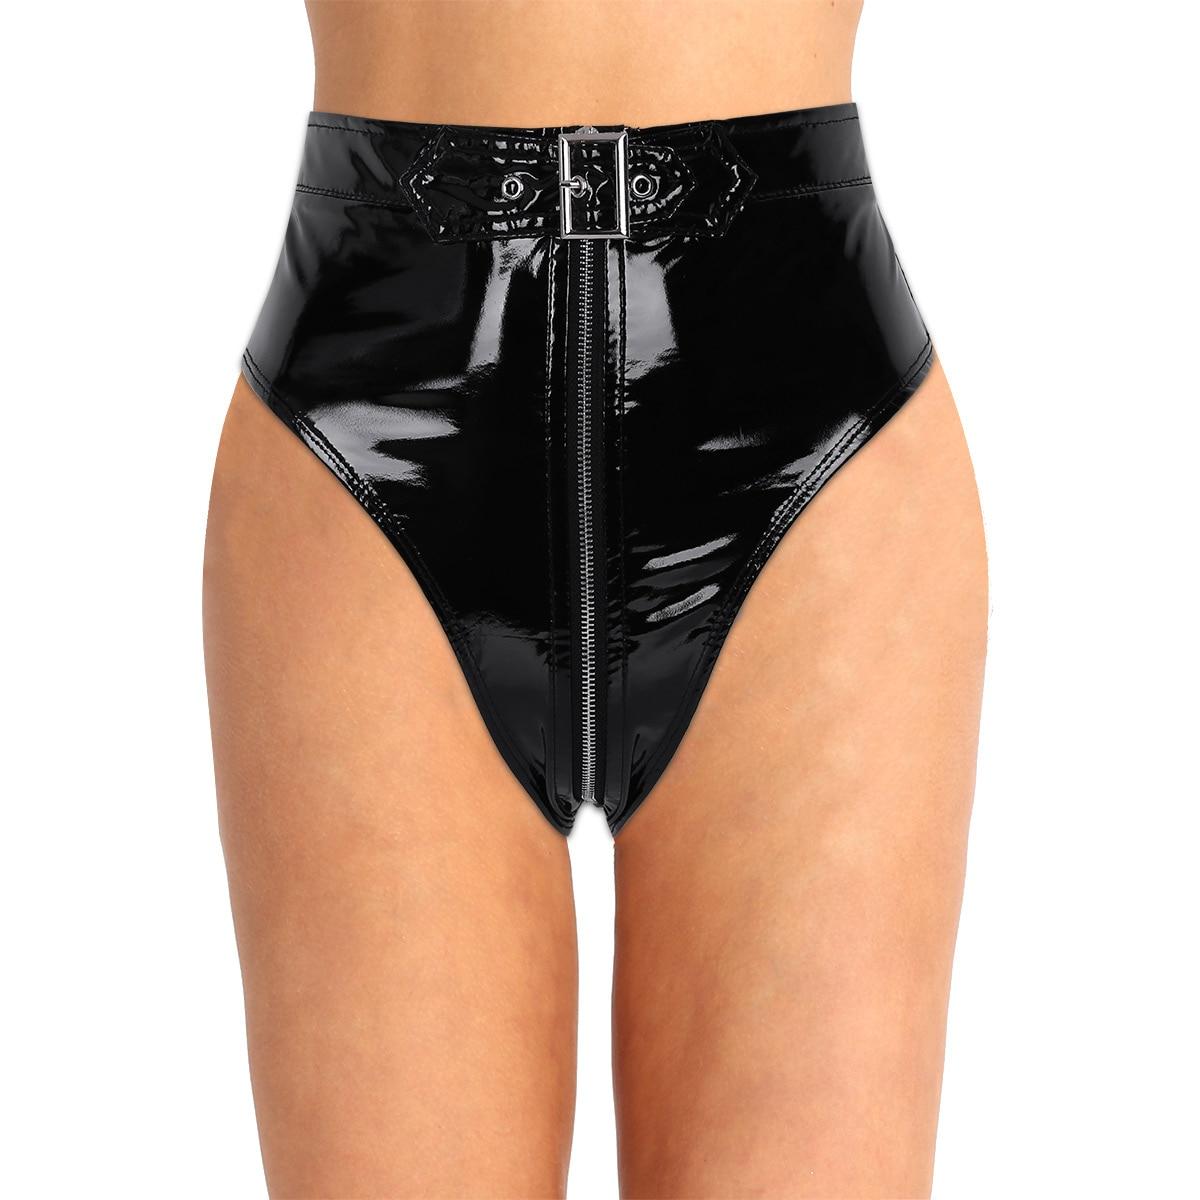 MSemis Women Wet Look Lingerie Women High Cut Underwear Sexy Thongs Panties Booty Shorts PVC Thong Zippered with Belt Briefs Harley-Davidson Sportster